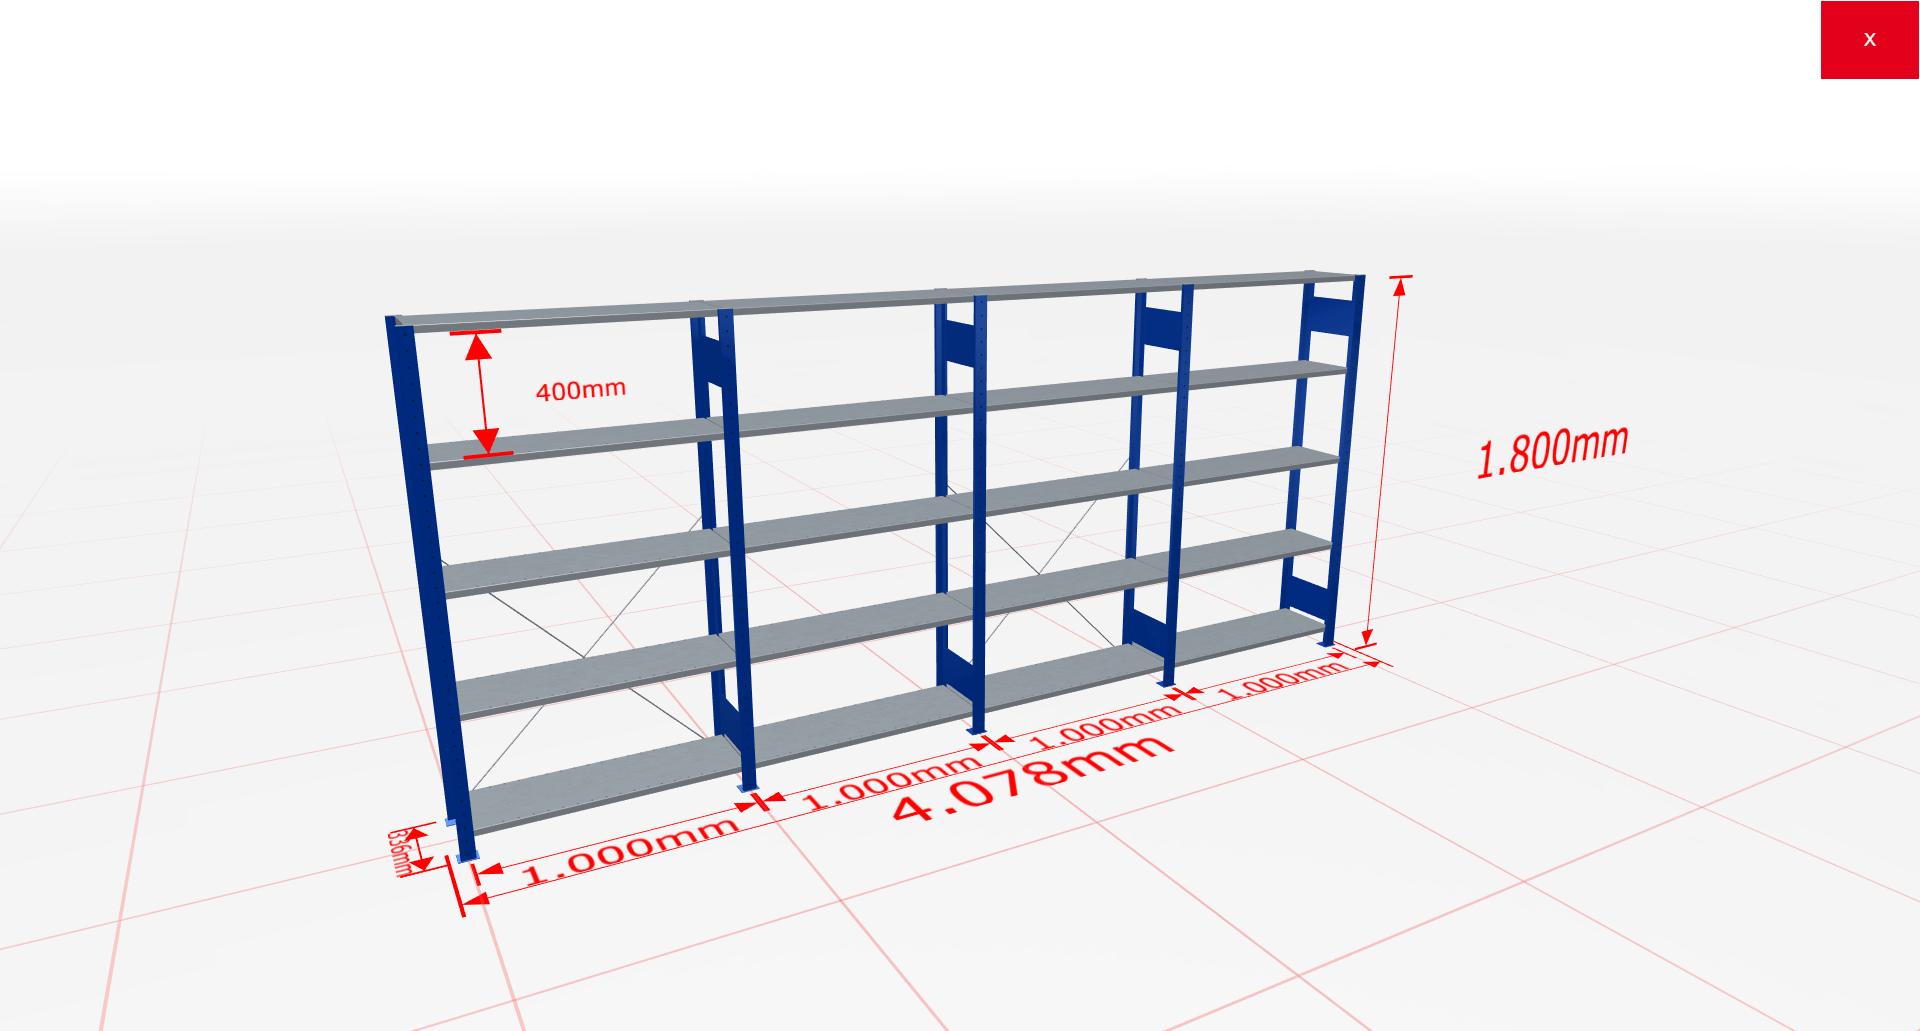 Fachbodenregal Komplettregal 1800x4078x300 mm (HxBxT) SCHULTE Lagertechnik blau 5 Ebenen  150 kg je Boden